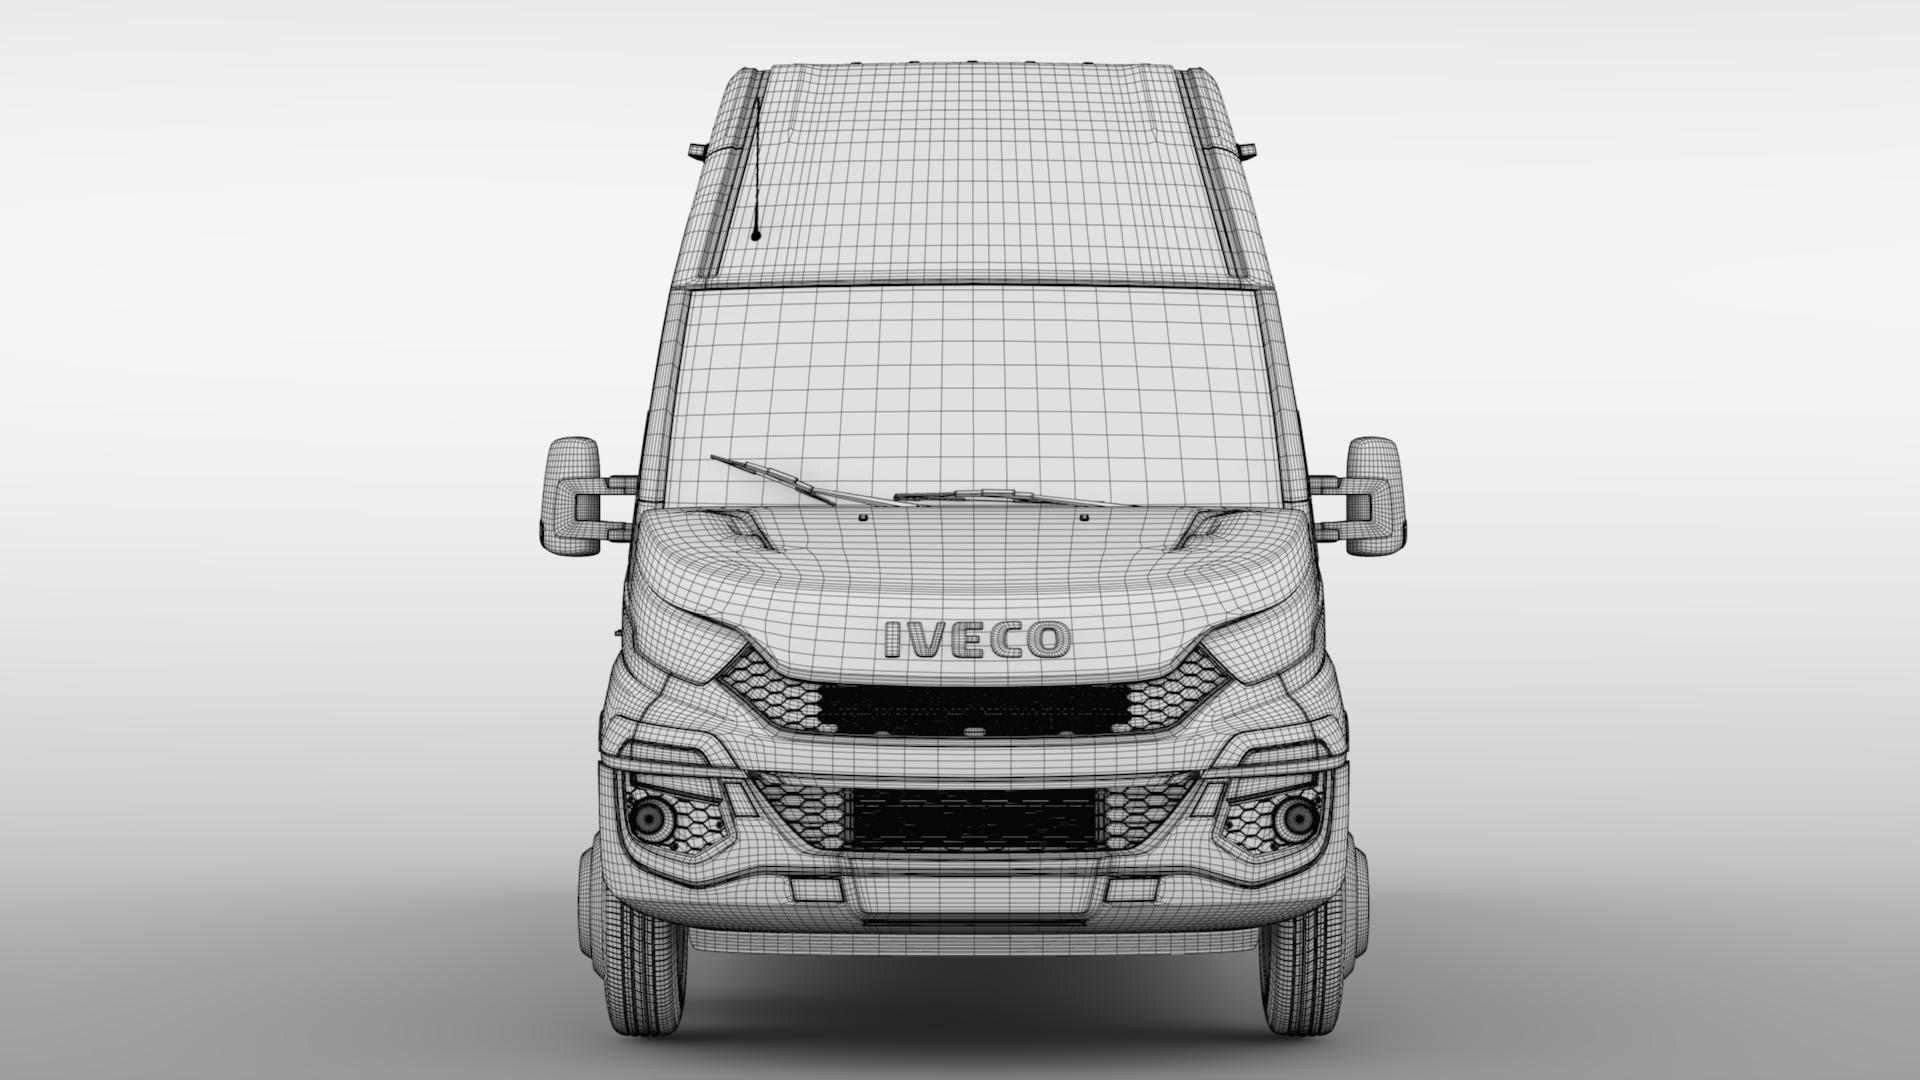 iveco daily tourus l4h3 2014-2016 3d model max fbx c4d lwo ma mb hrc xsi obj 276246